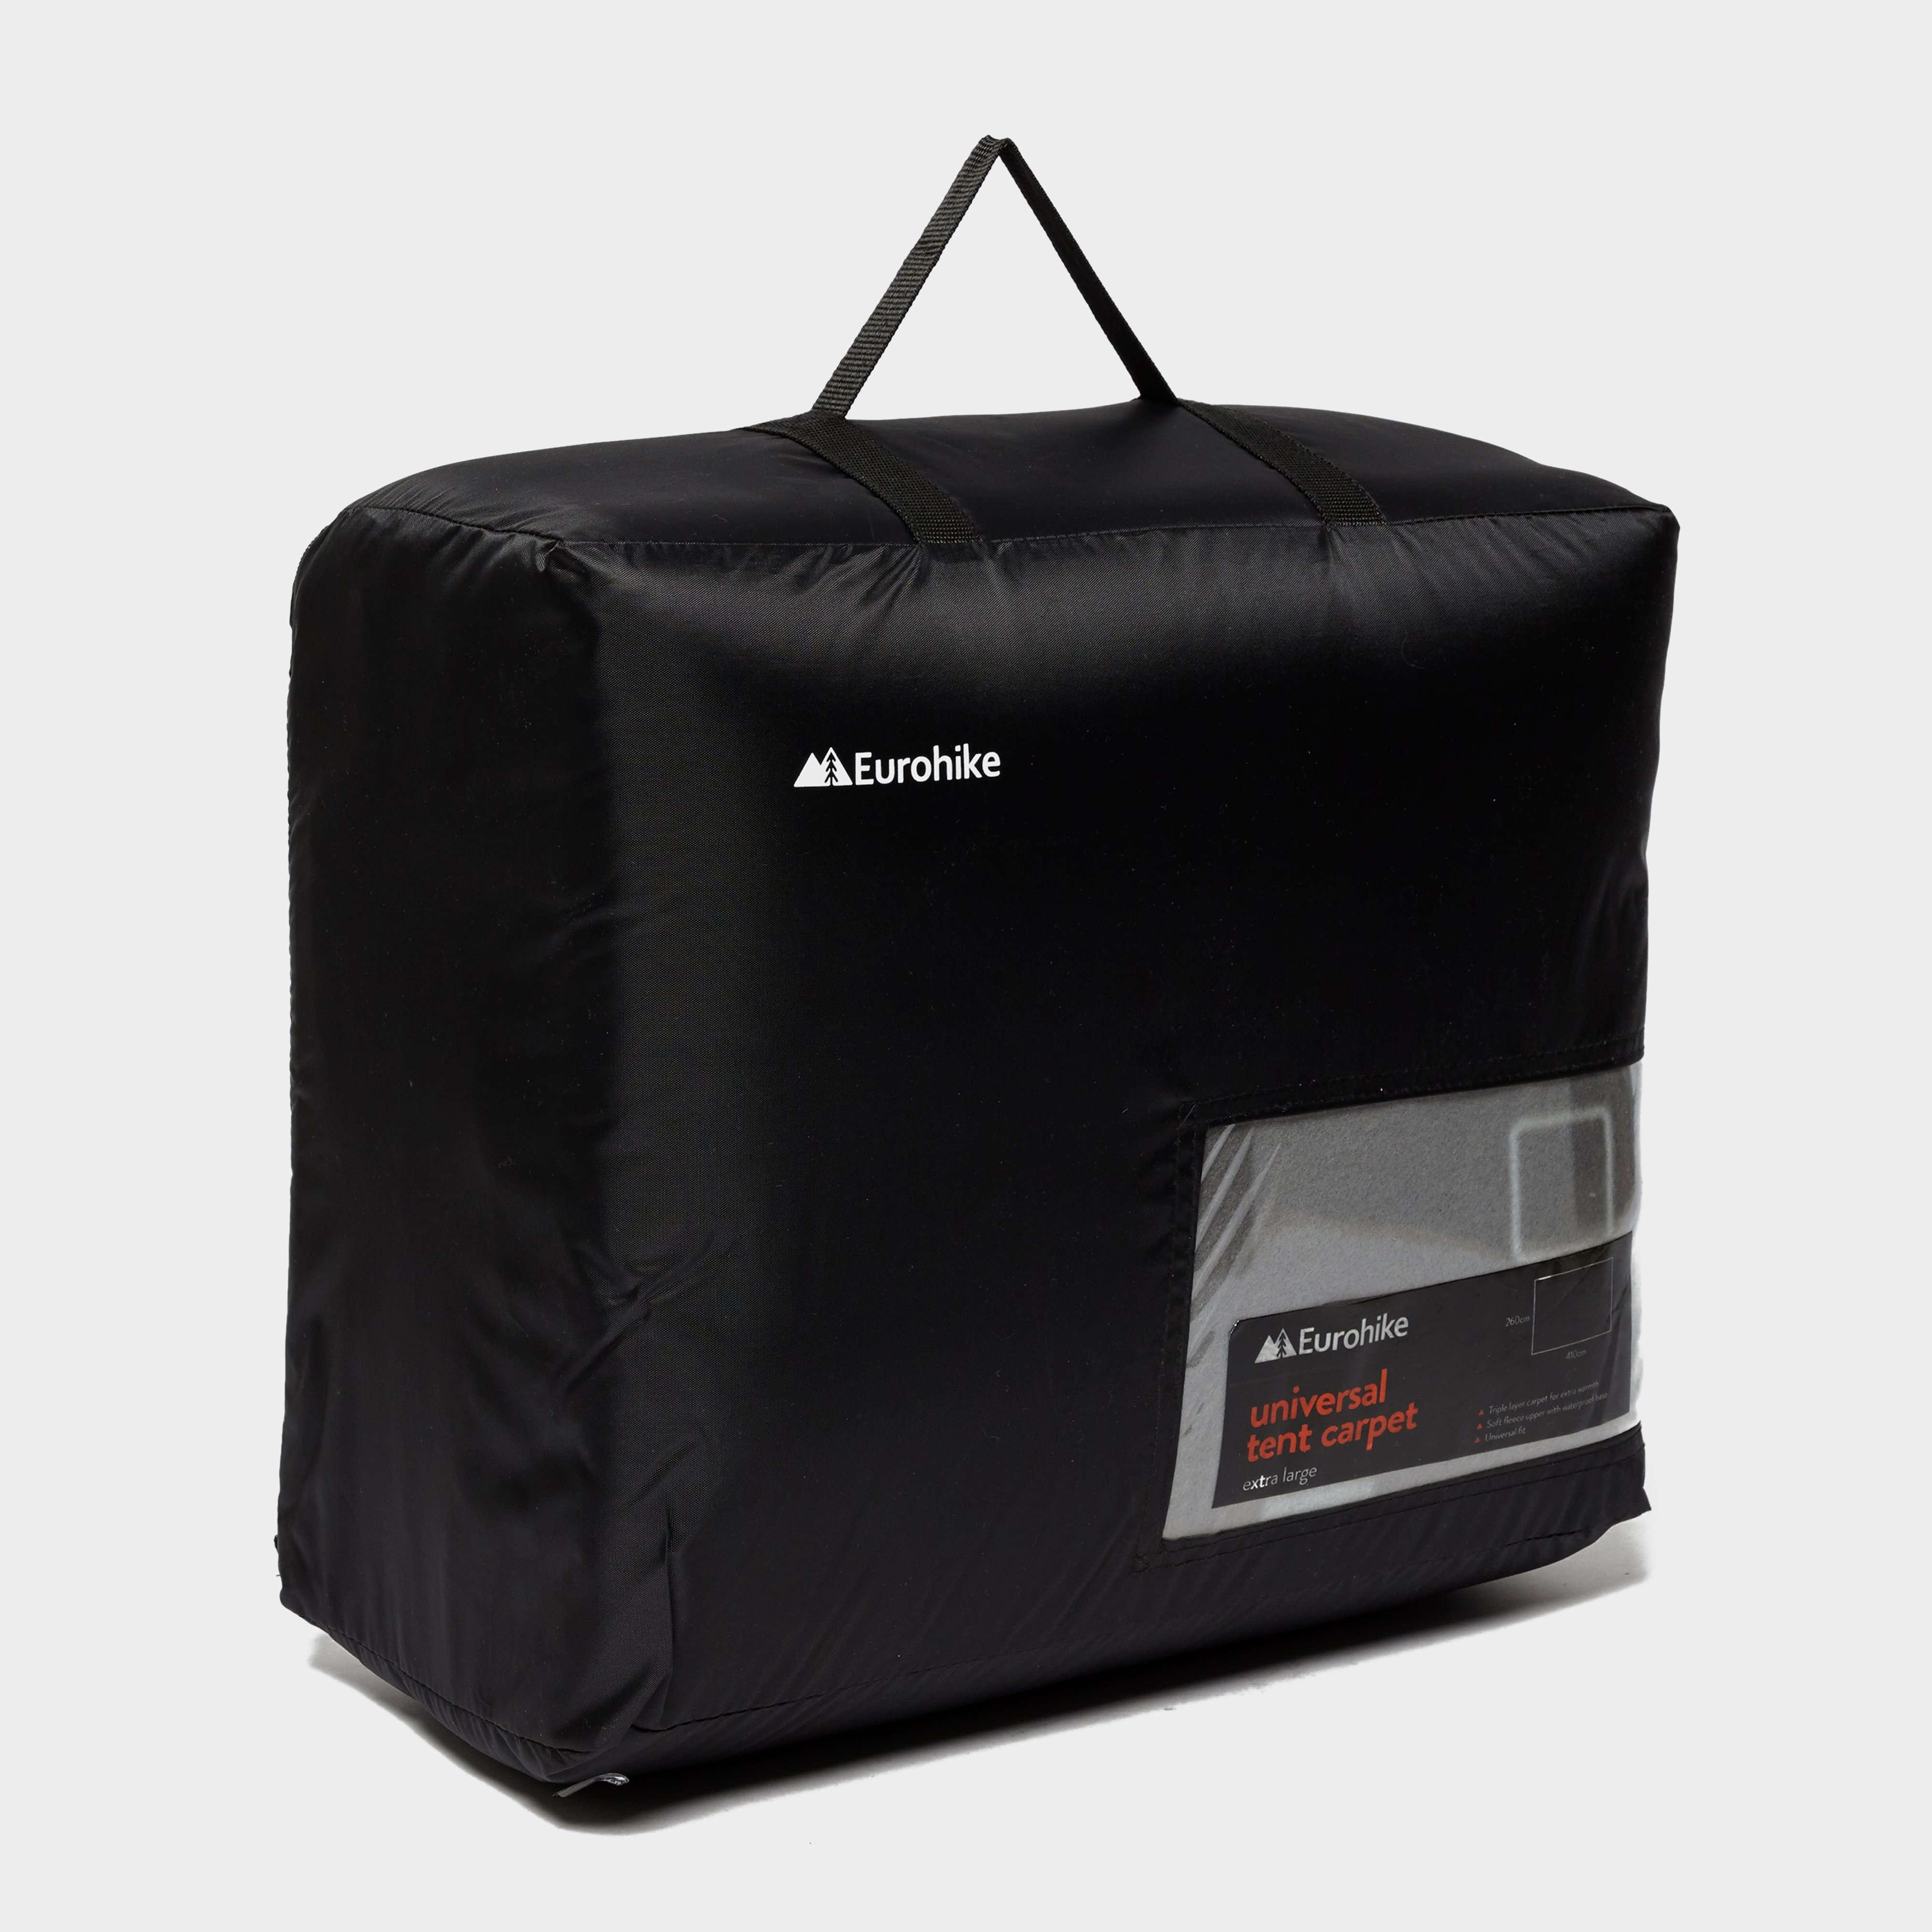 EUROHIKE Universal Tent Carpet - XL